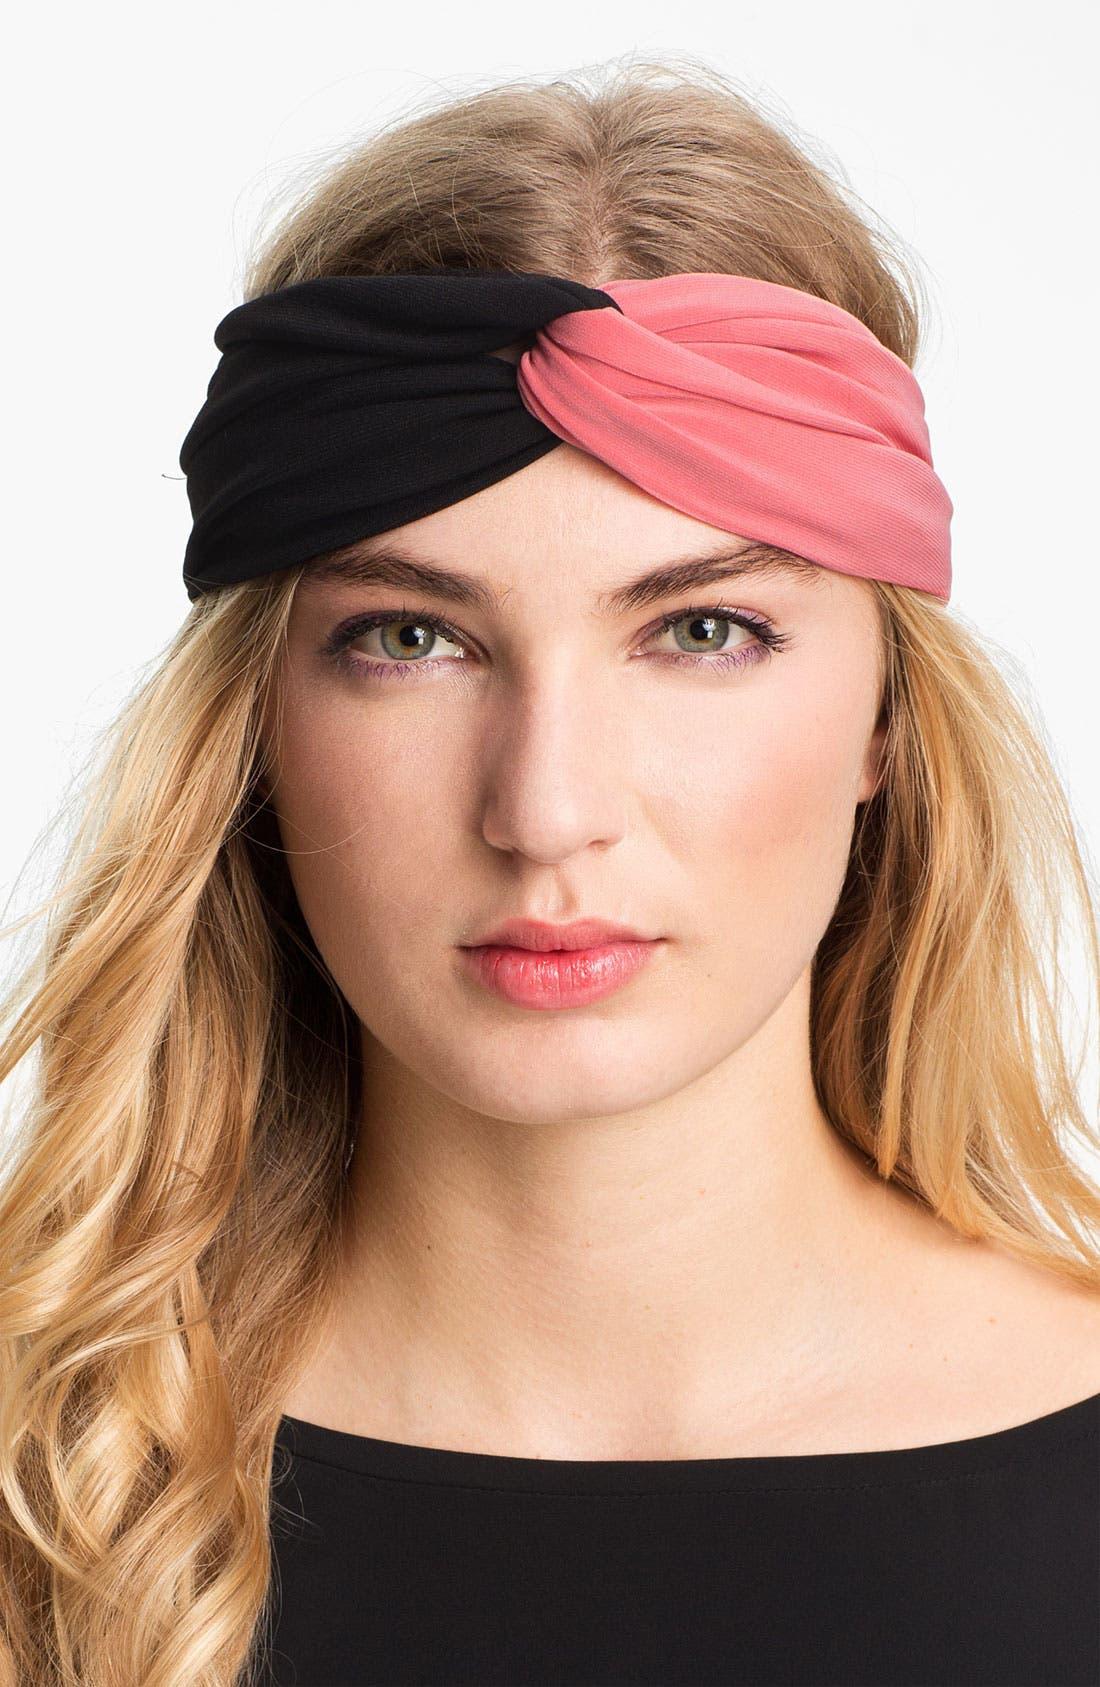 Main Image - Tasha Two Tone Turban Head Wrap